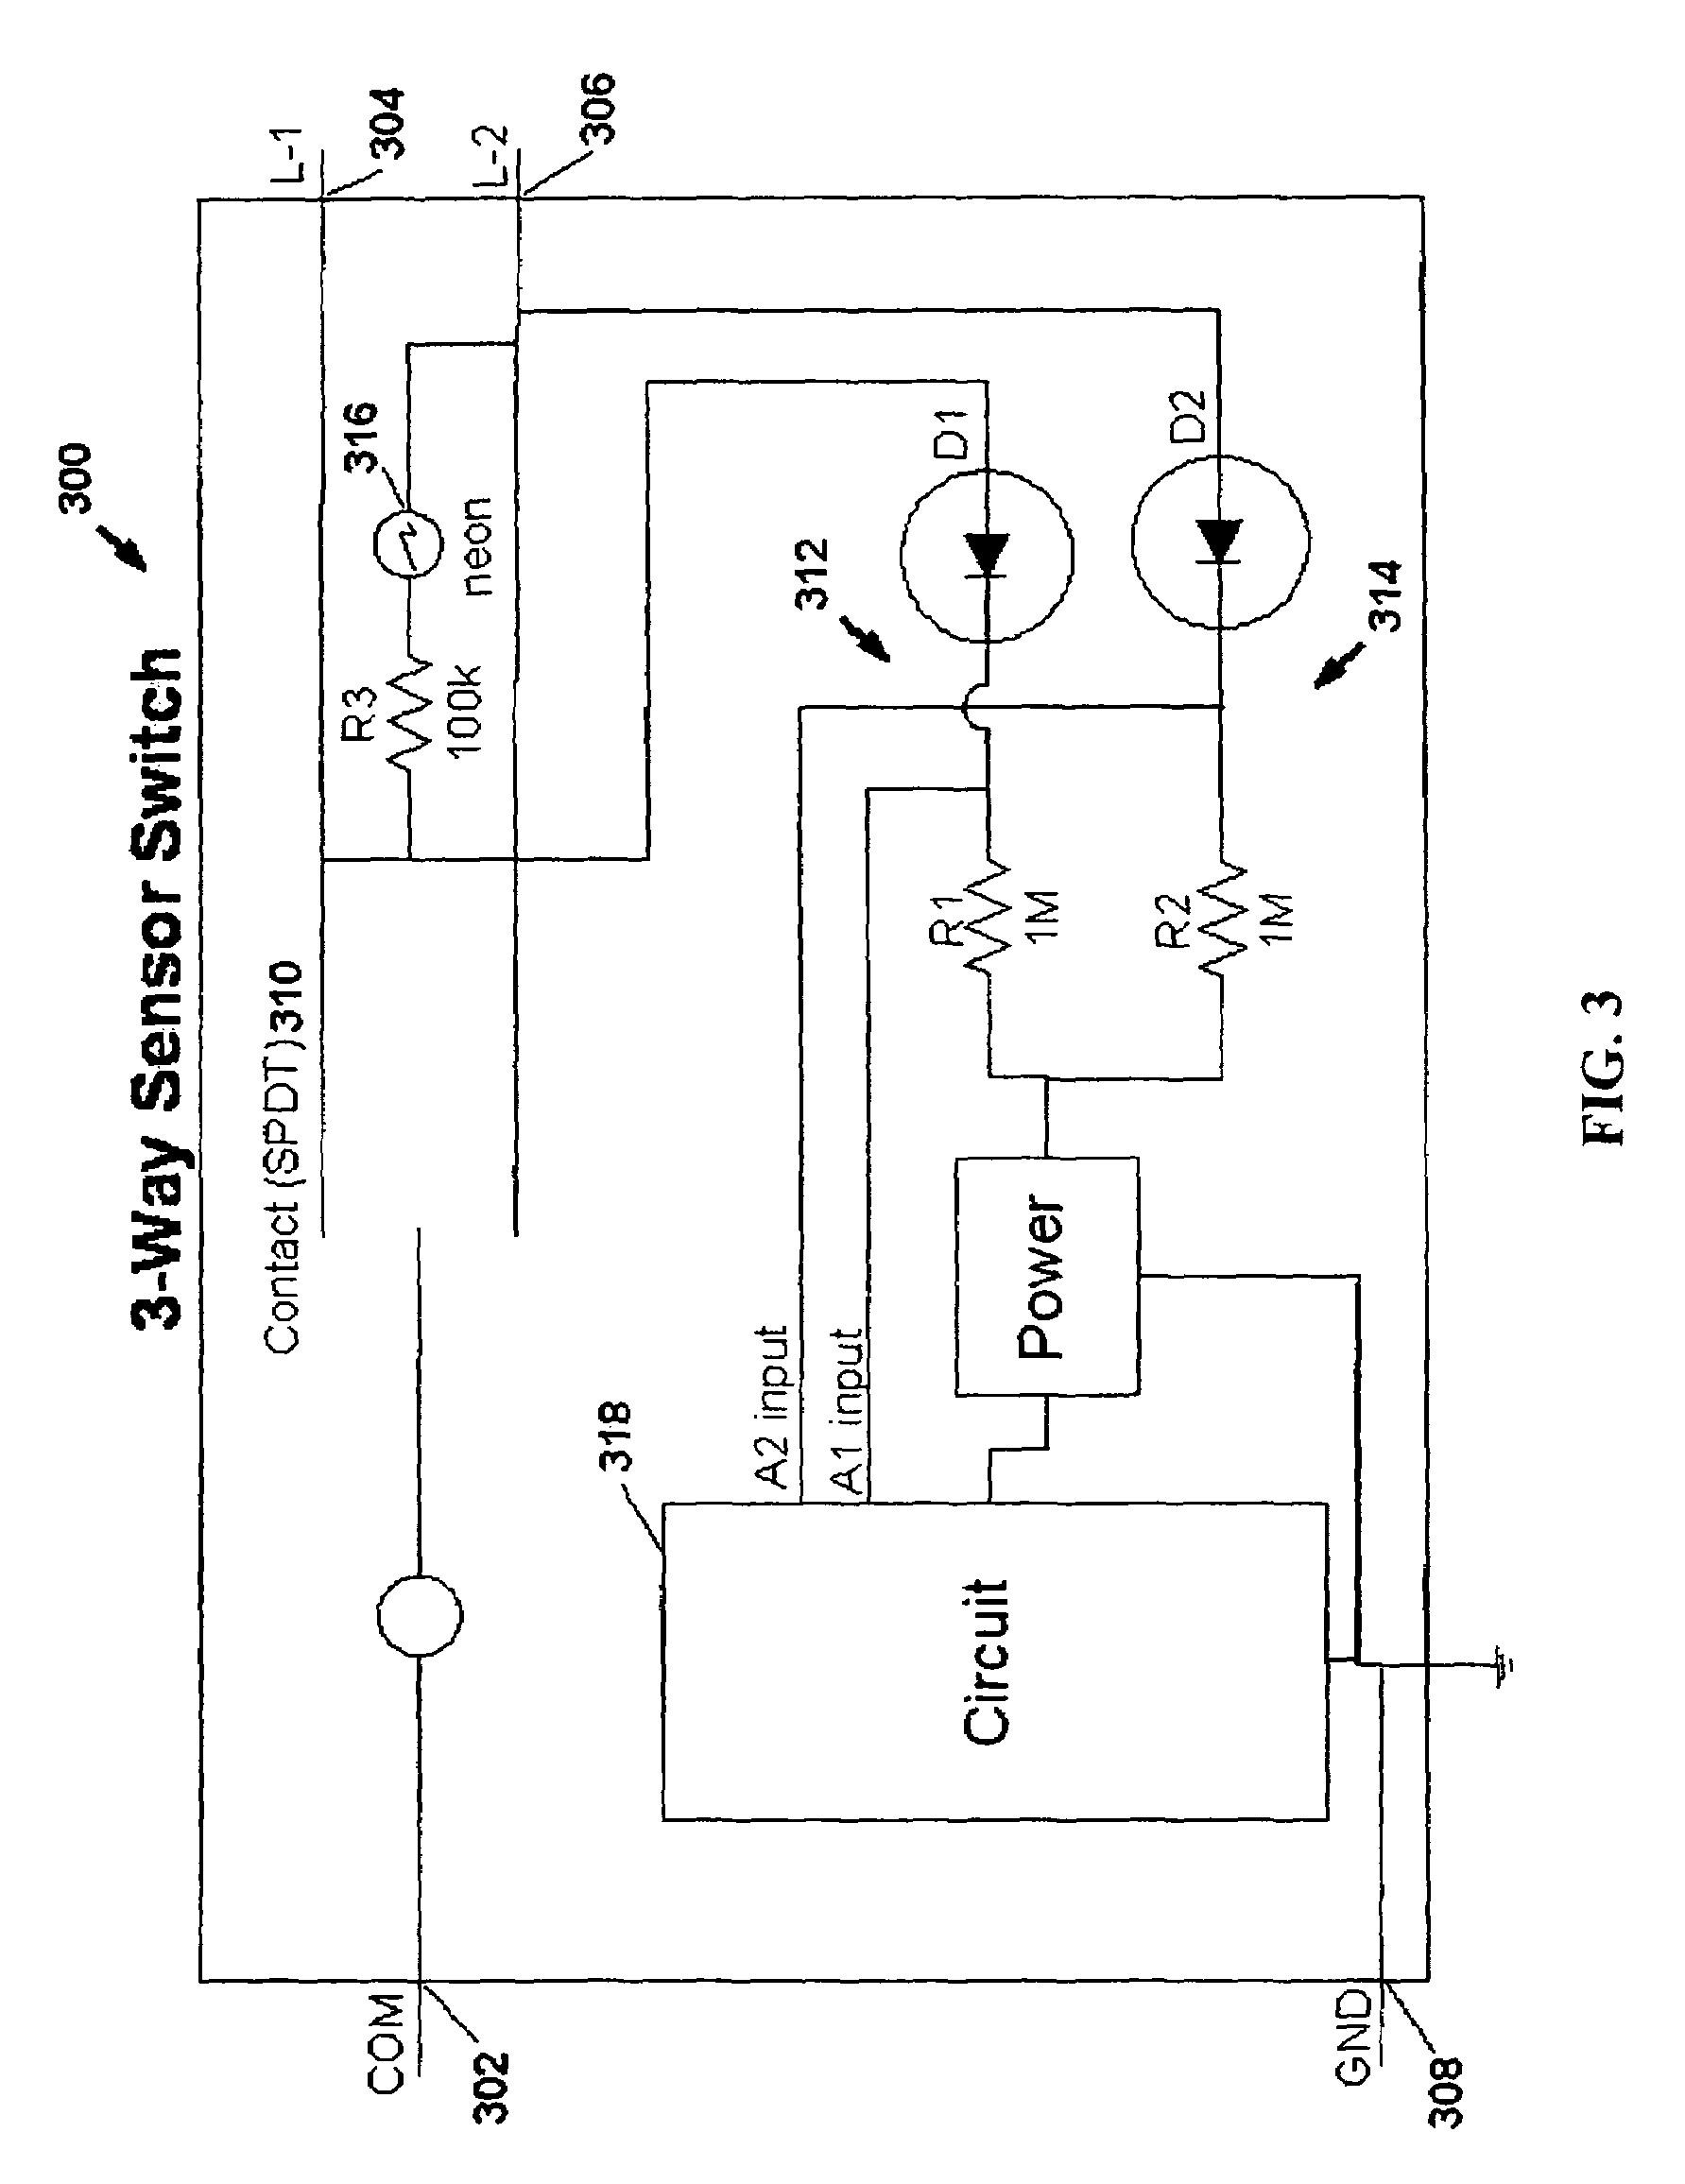 Pir Motion Sensor Wiring Diagram Patent Us Motion Sensor Switch for ...